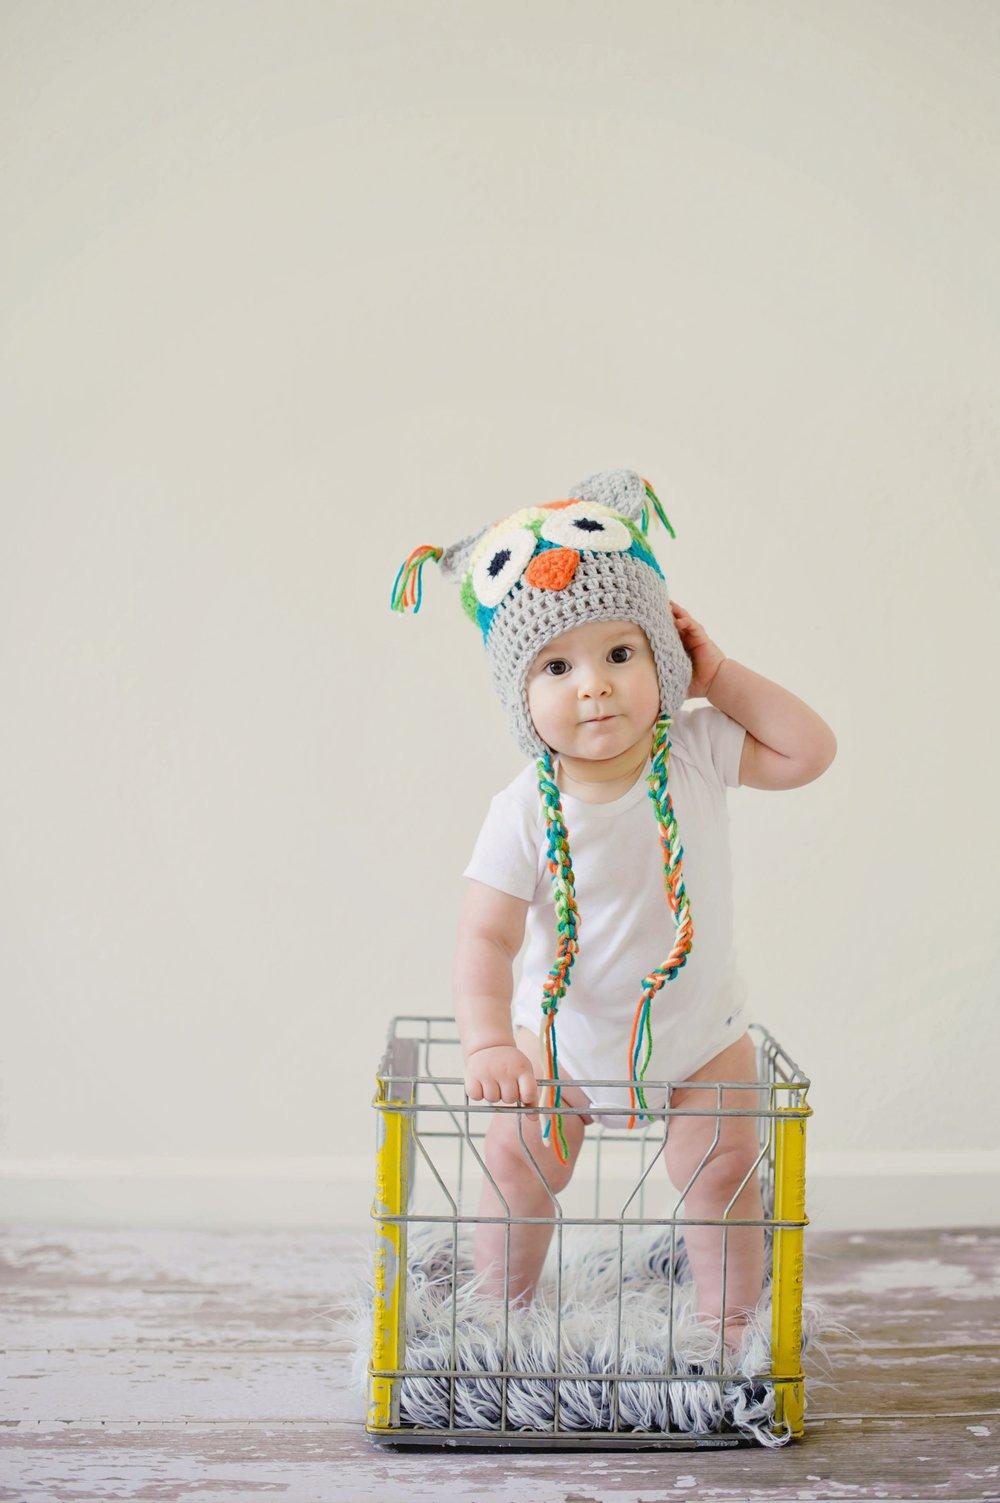 adorable-baby-baby-girl-459957.jpg